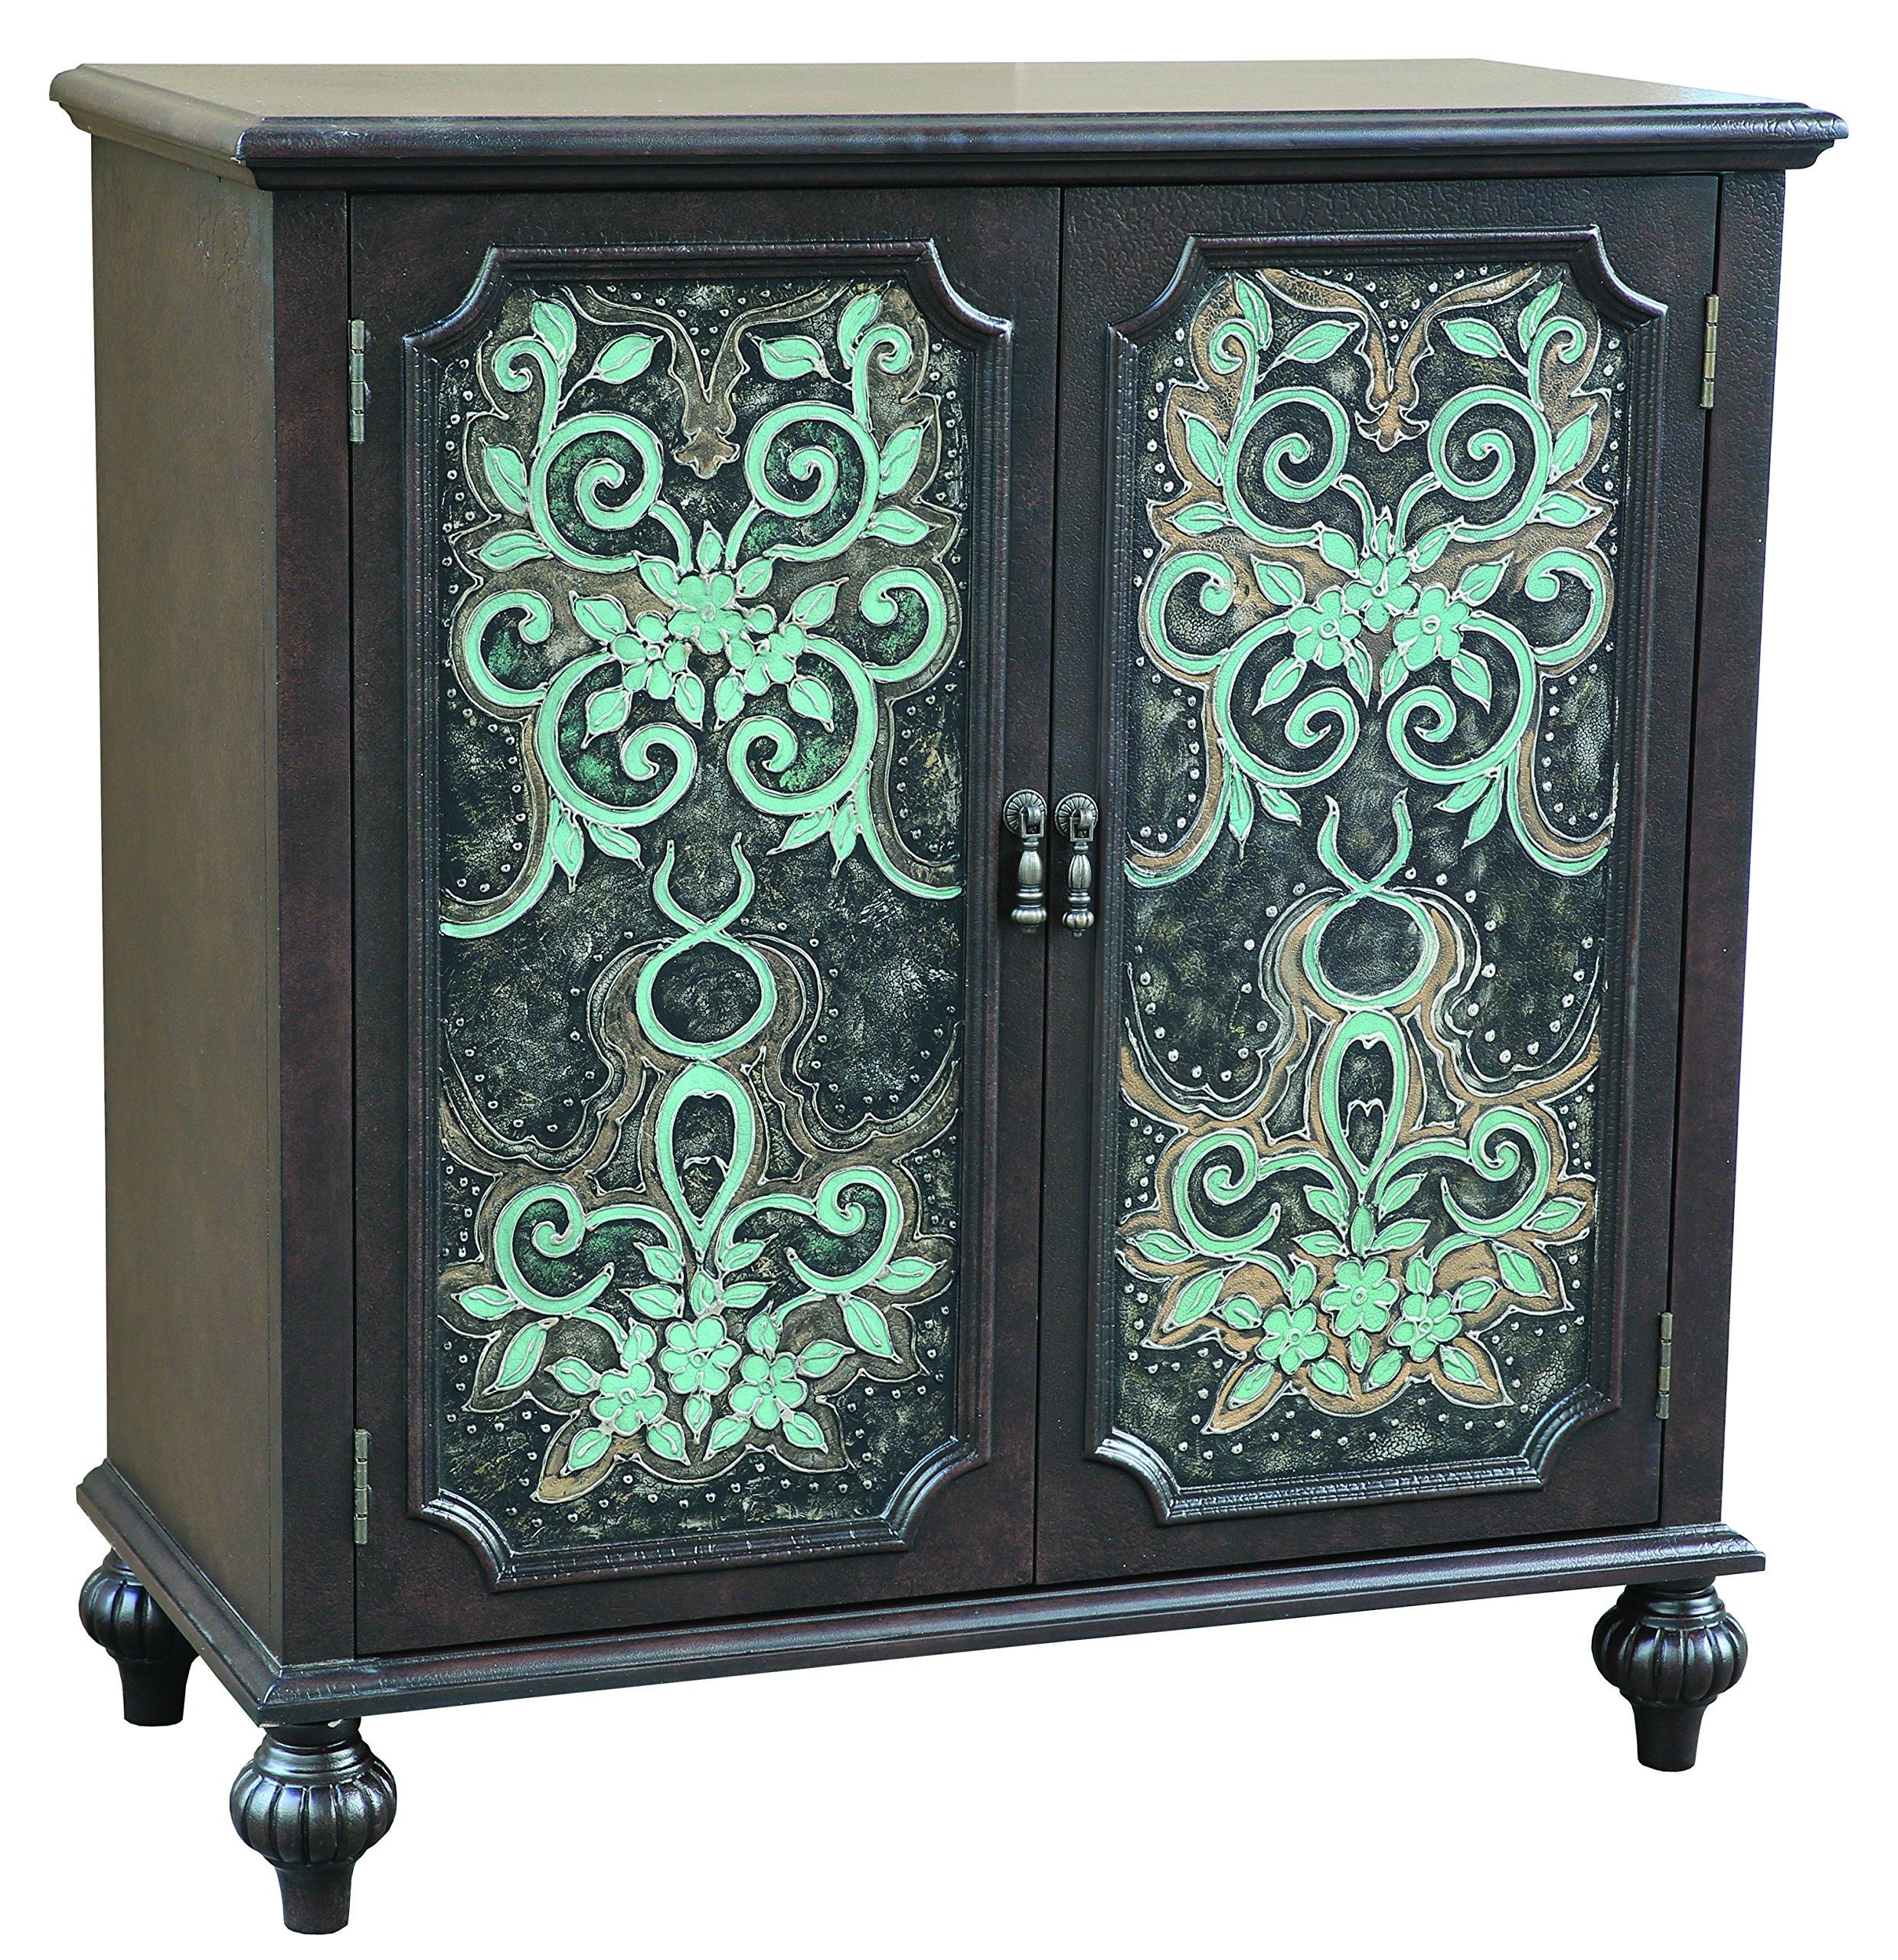 bedroom storage cabinets amazon com rh amazon com bedroom storage cabinets ideas bedroom storage cabinets designs